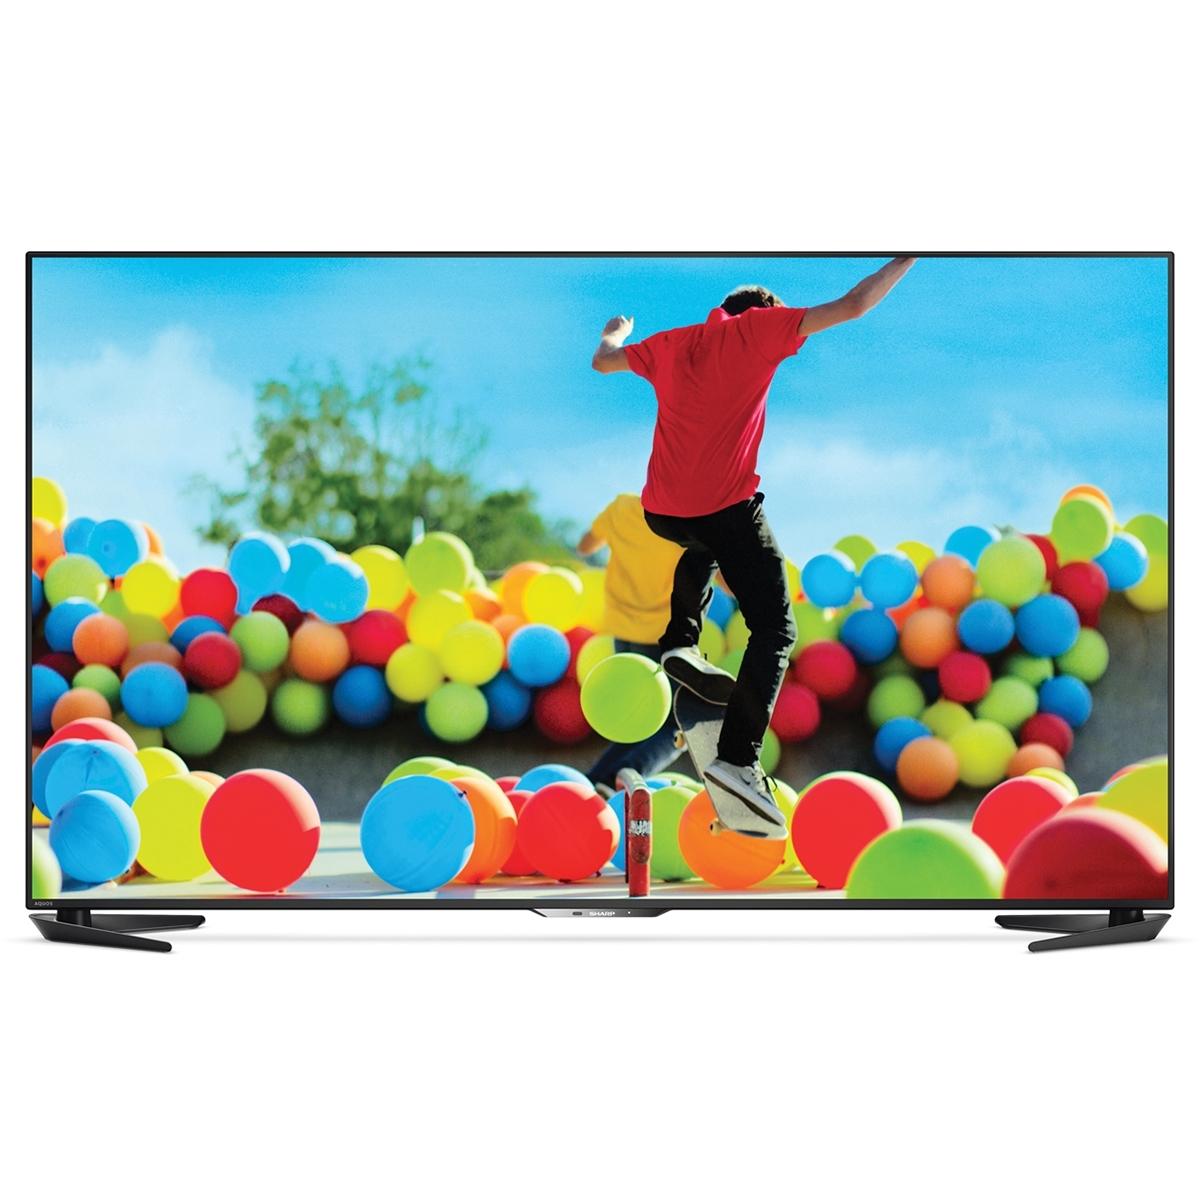 Sharp AQUOS 80inch LED 4K Ultra HDTV - LC-80UE30U